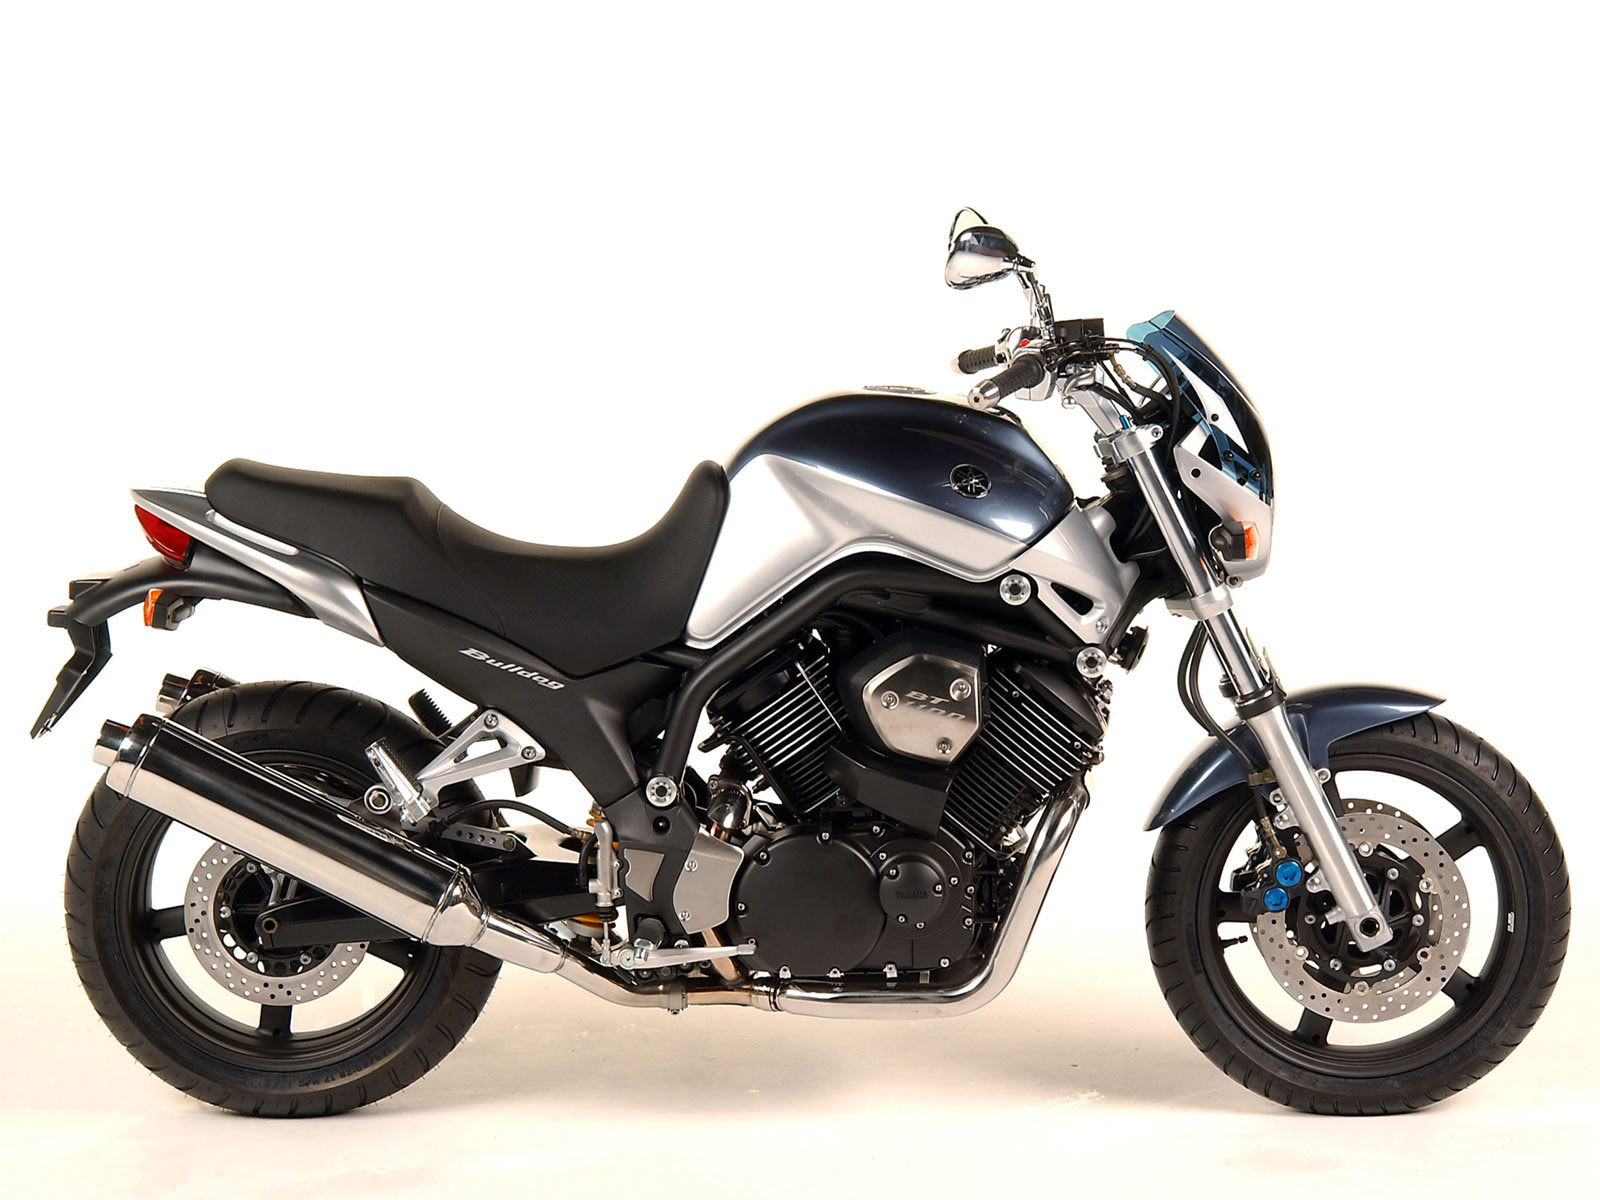 MOTORCYCLE BIG BIKE 2005 YAMAHA BT1100 Bulldog